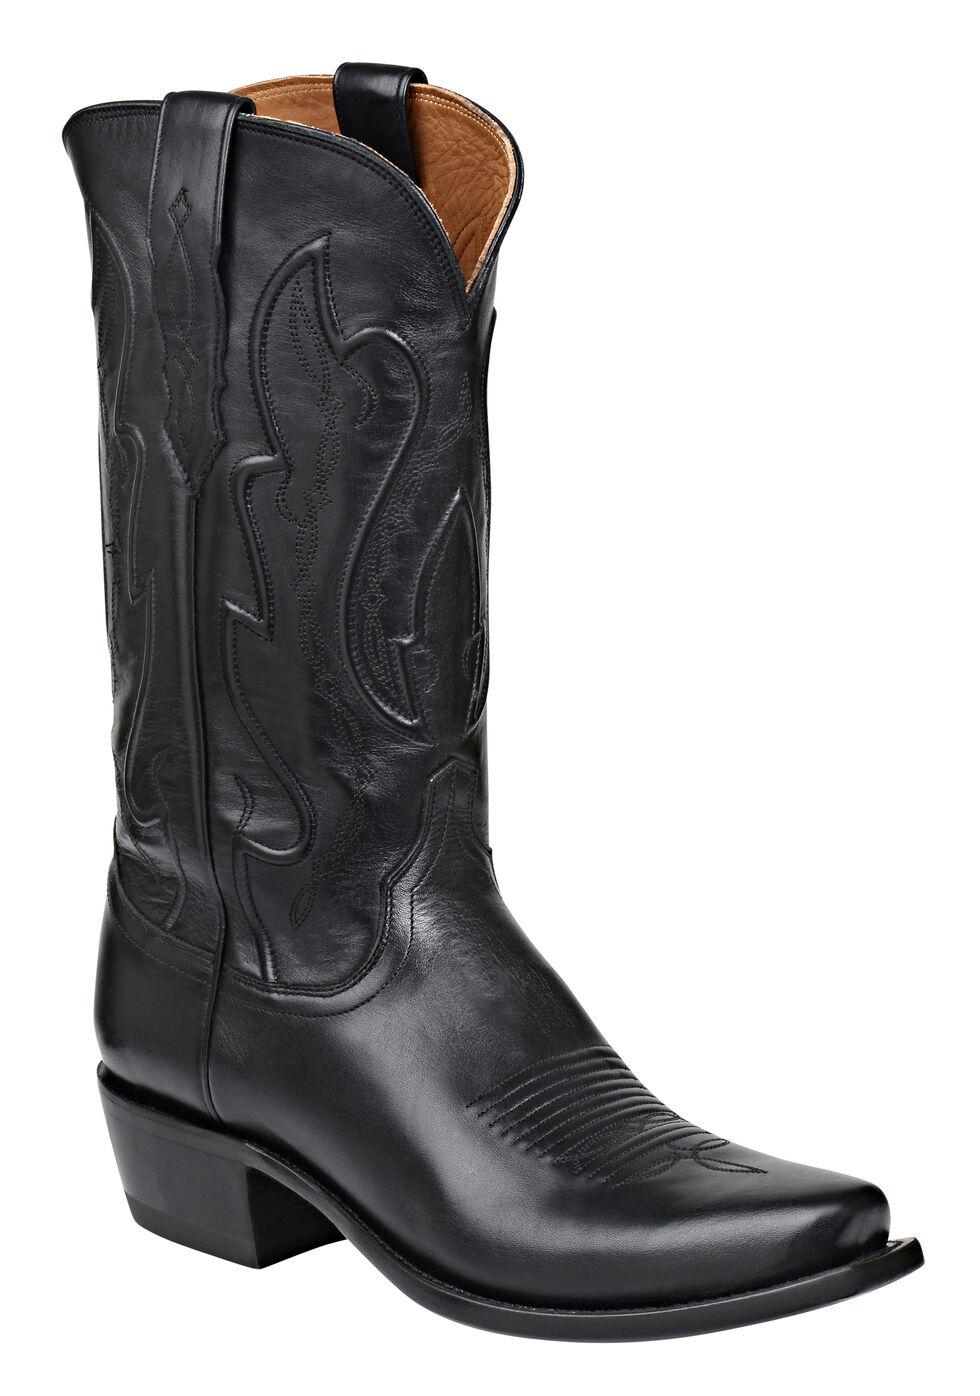 Lucchese Handmade 1883 Men's Cole Cowboy Boots - Snip Toe, Black, hi-res